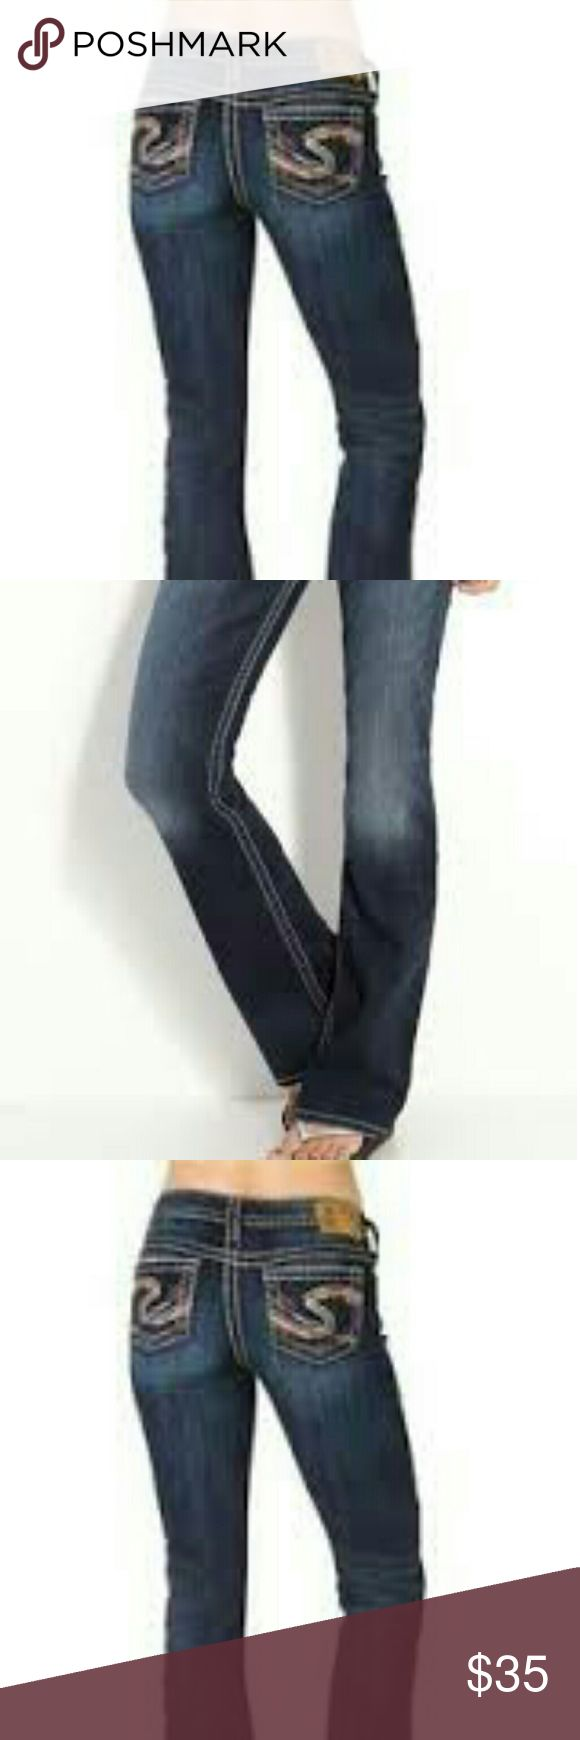 Ca00508 silver suki 27 x 32 womens bootcut jeans Ca00508 silver suki 27 x 32 womens bootcut jeans Jeans Boot Cut